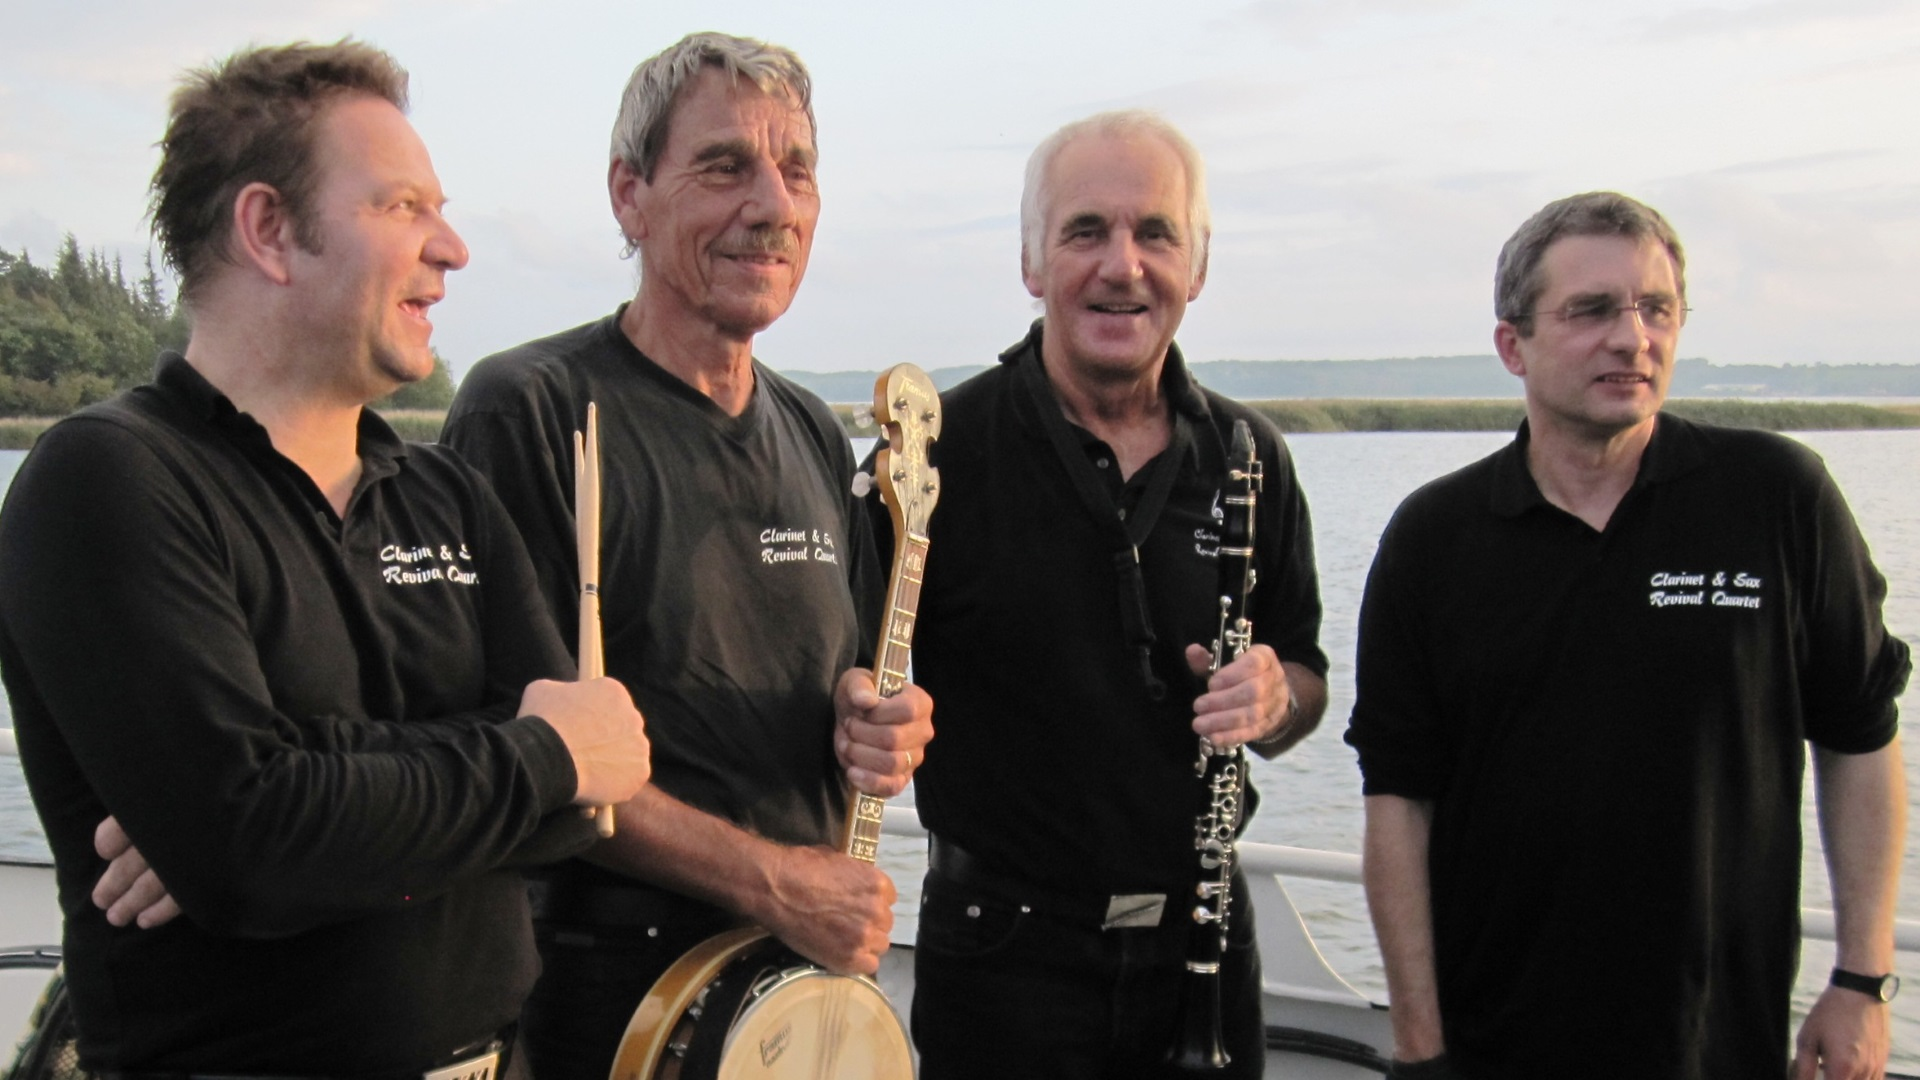 Ulf Schirmer - Clarinet & Sax Revival Quartet